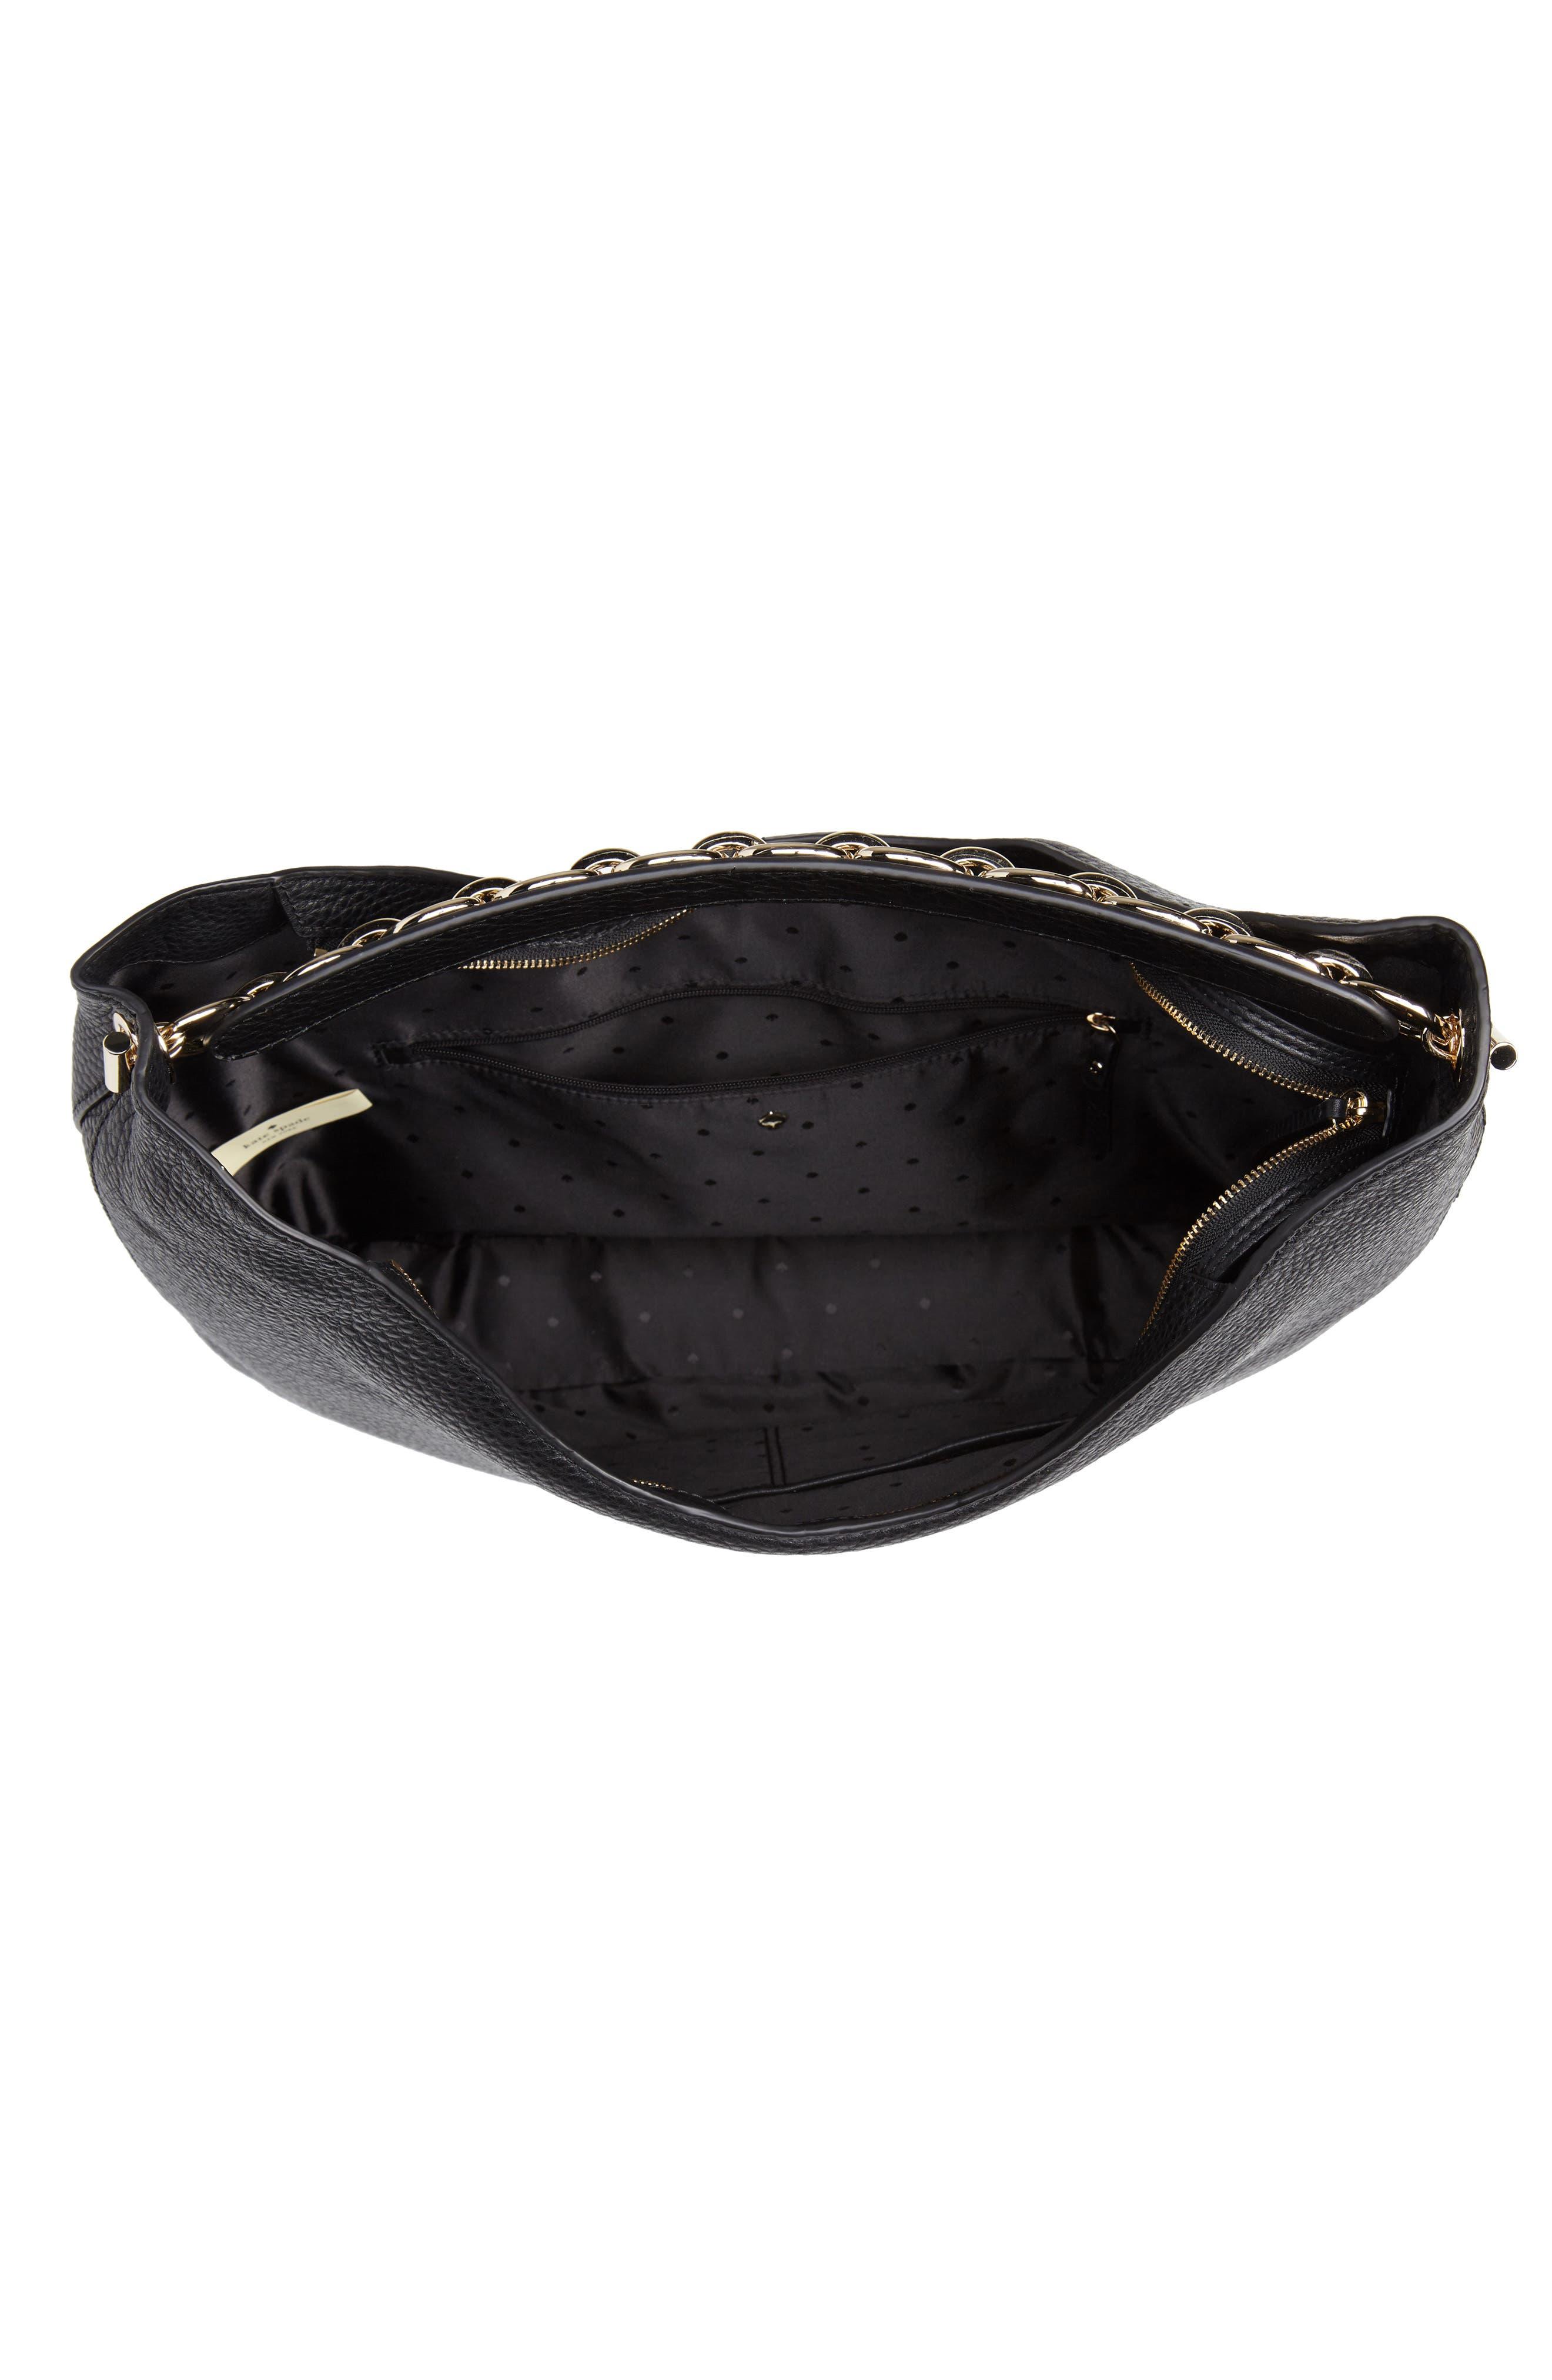 murray street heather pebbled leather hobo bag,                             Alternate thumbnail 4, color,                             BLACK